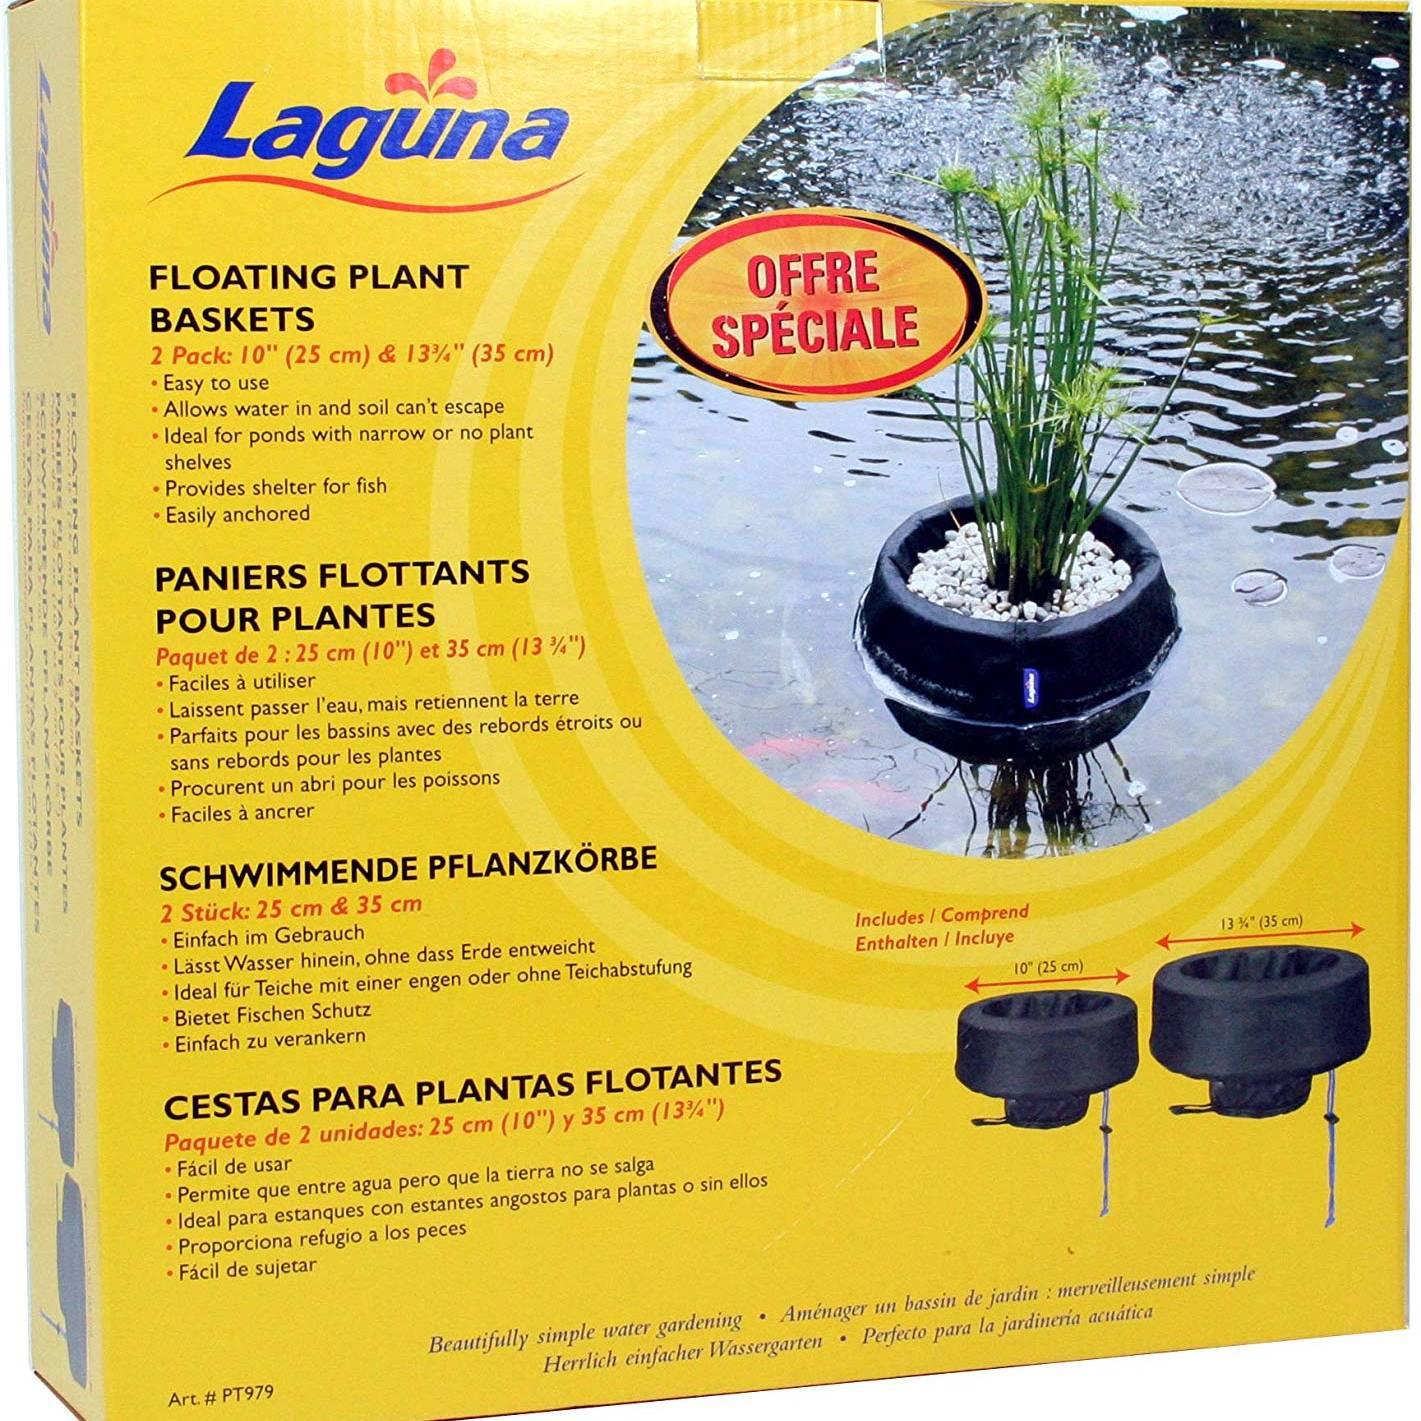 Laguna Floating Planting Basket Kit (1 X 25cm, 1 X 35cm)